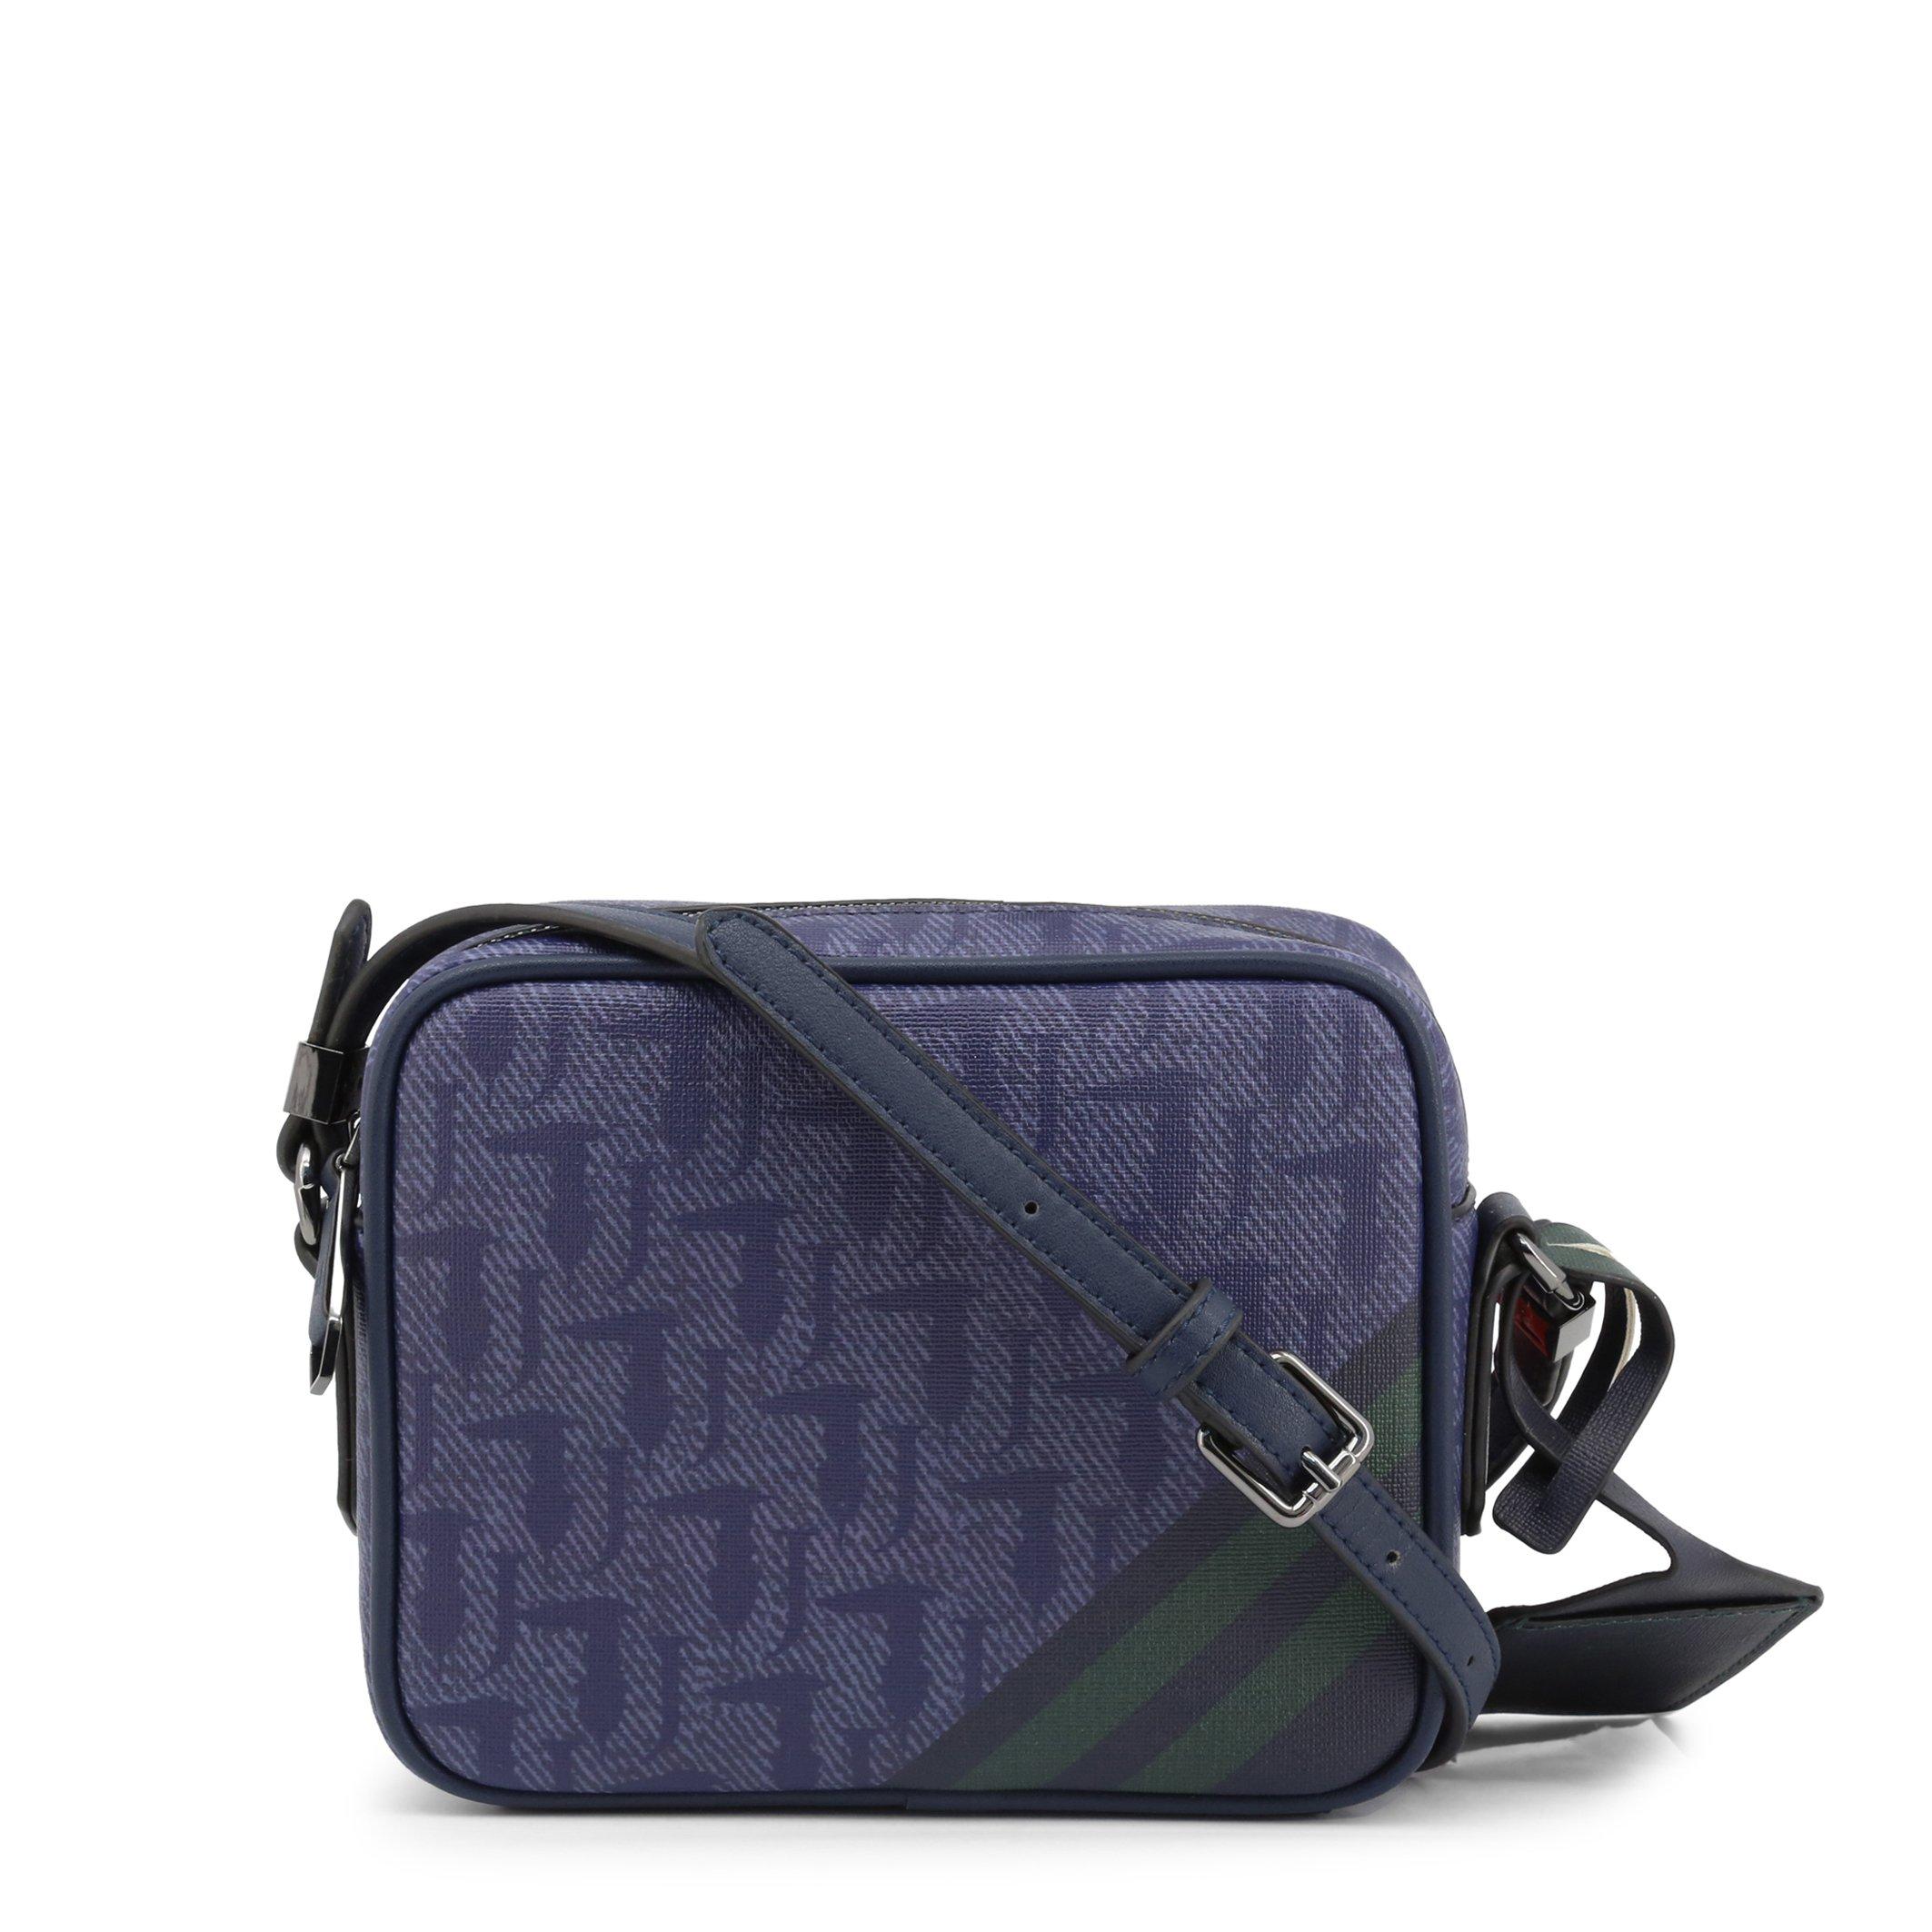 Trussardi Women's Crossbody Bag Various Colours VANIGLIA_75B00479 - blue NOSIZE